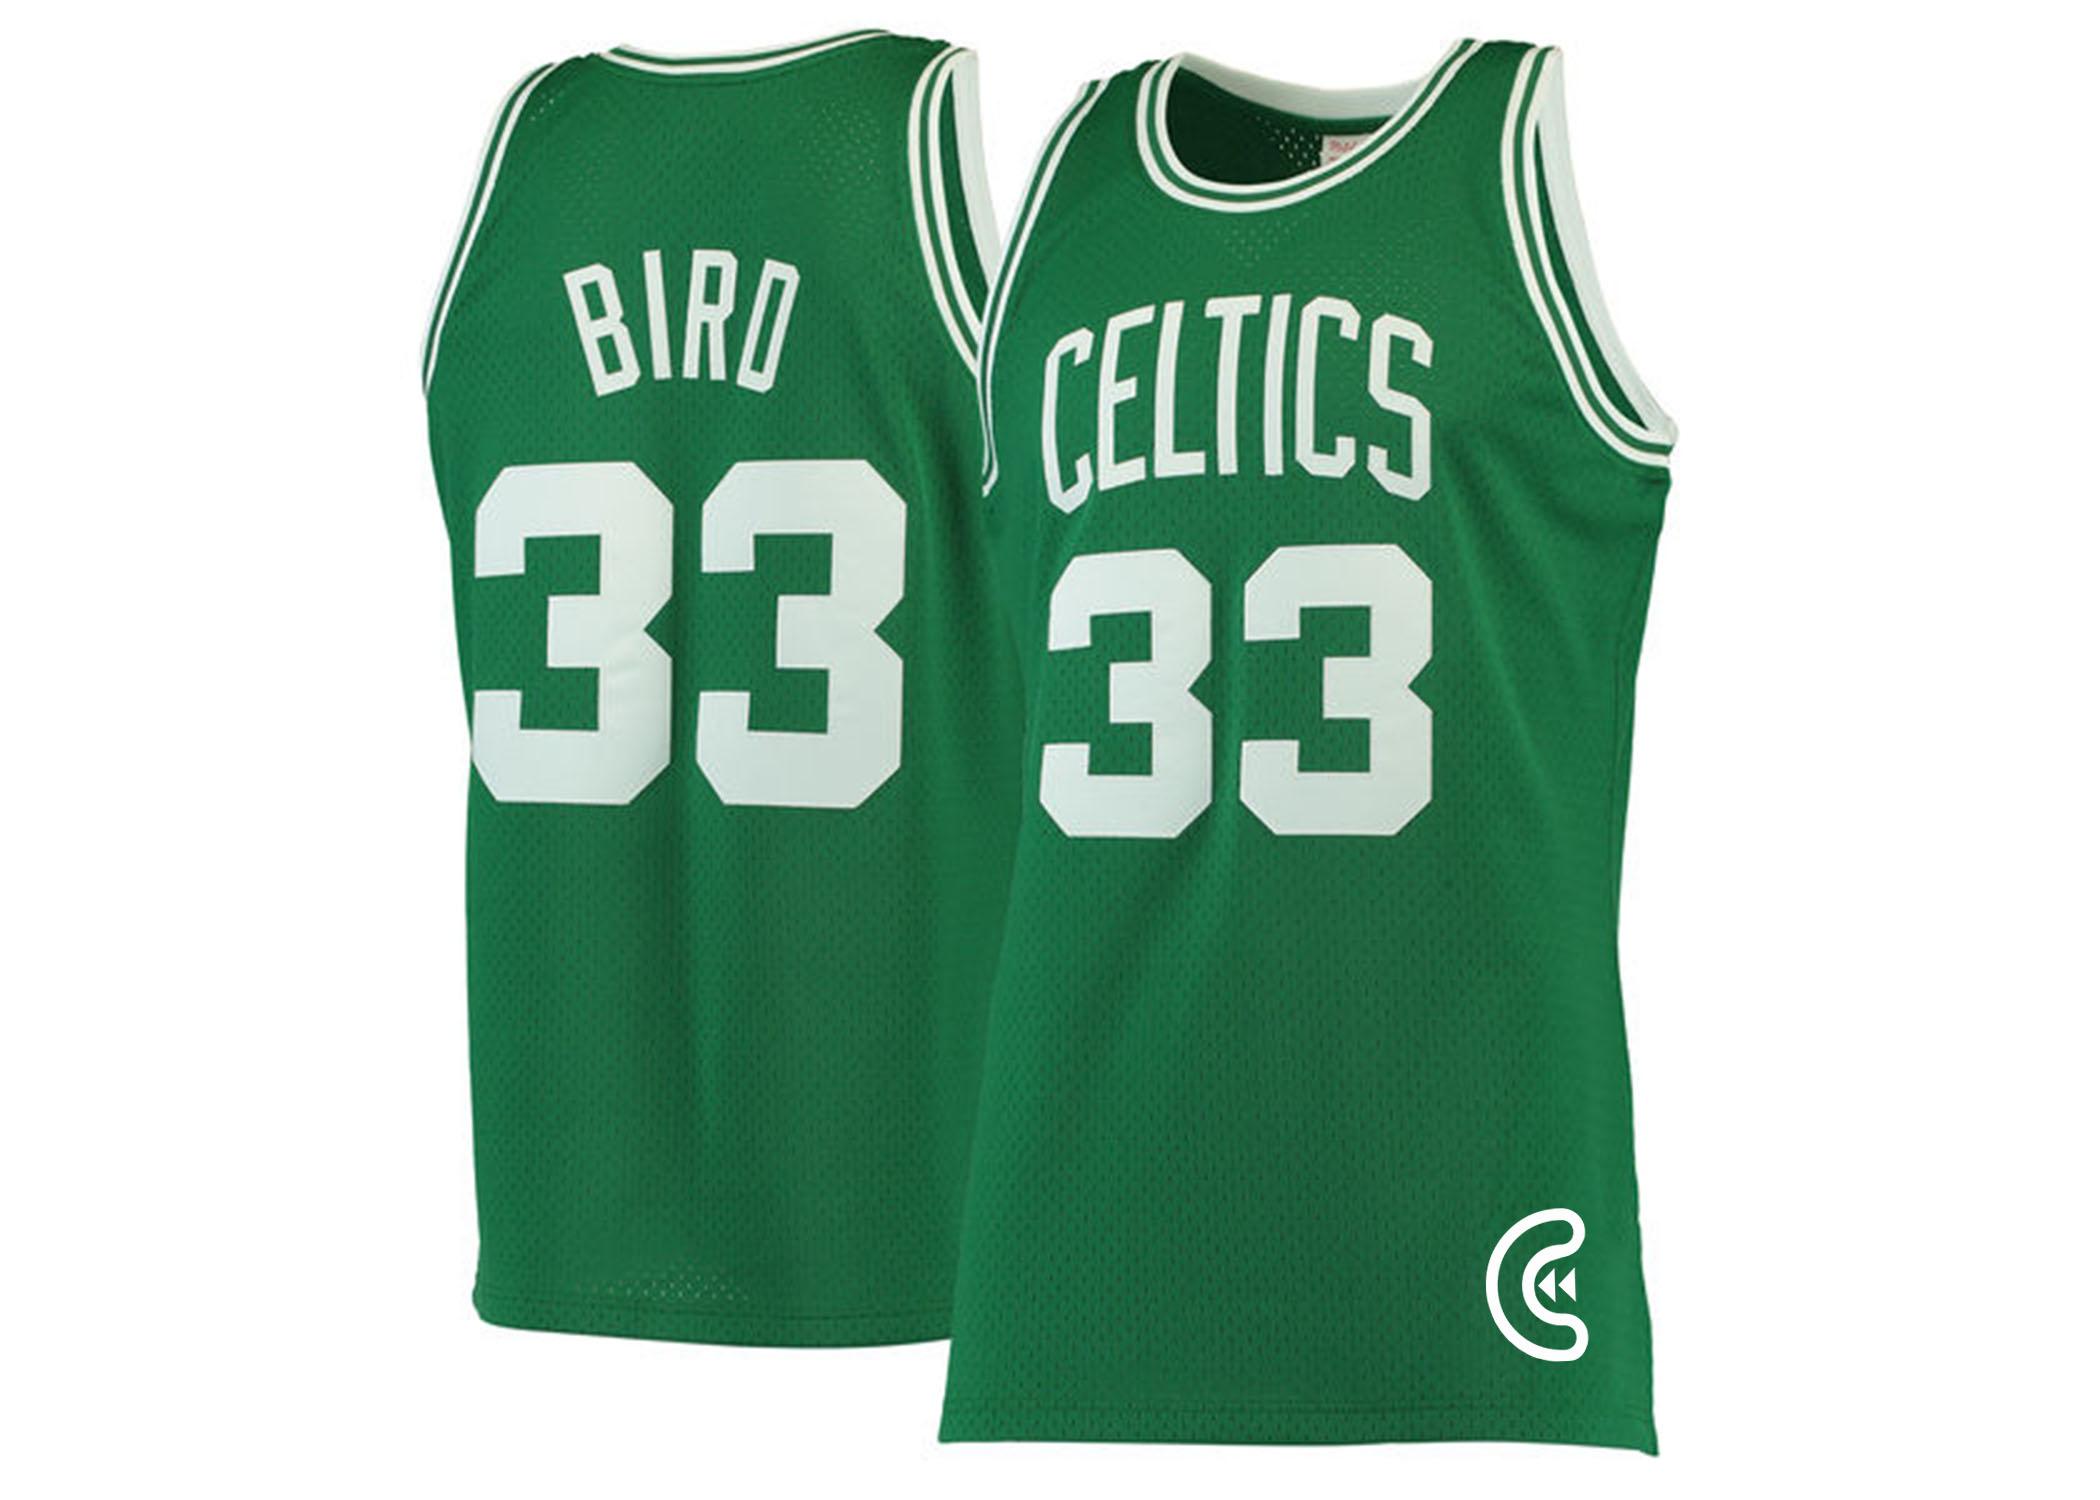 Larry Bird -Celtics    $249.99